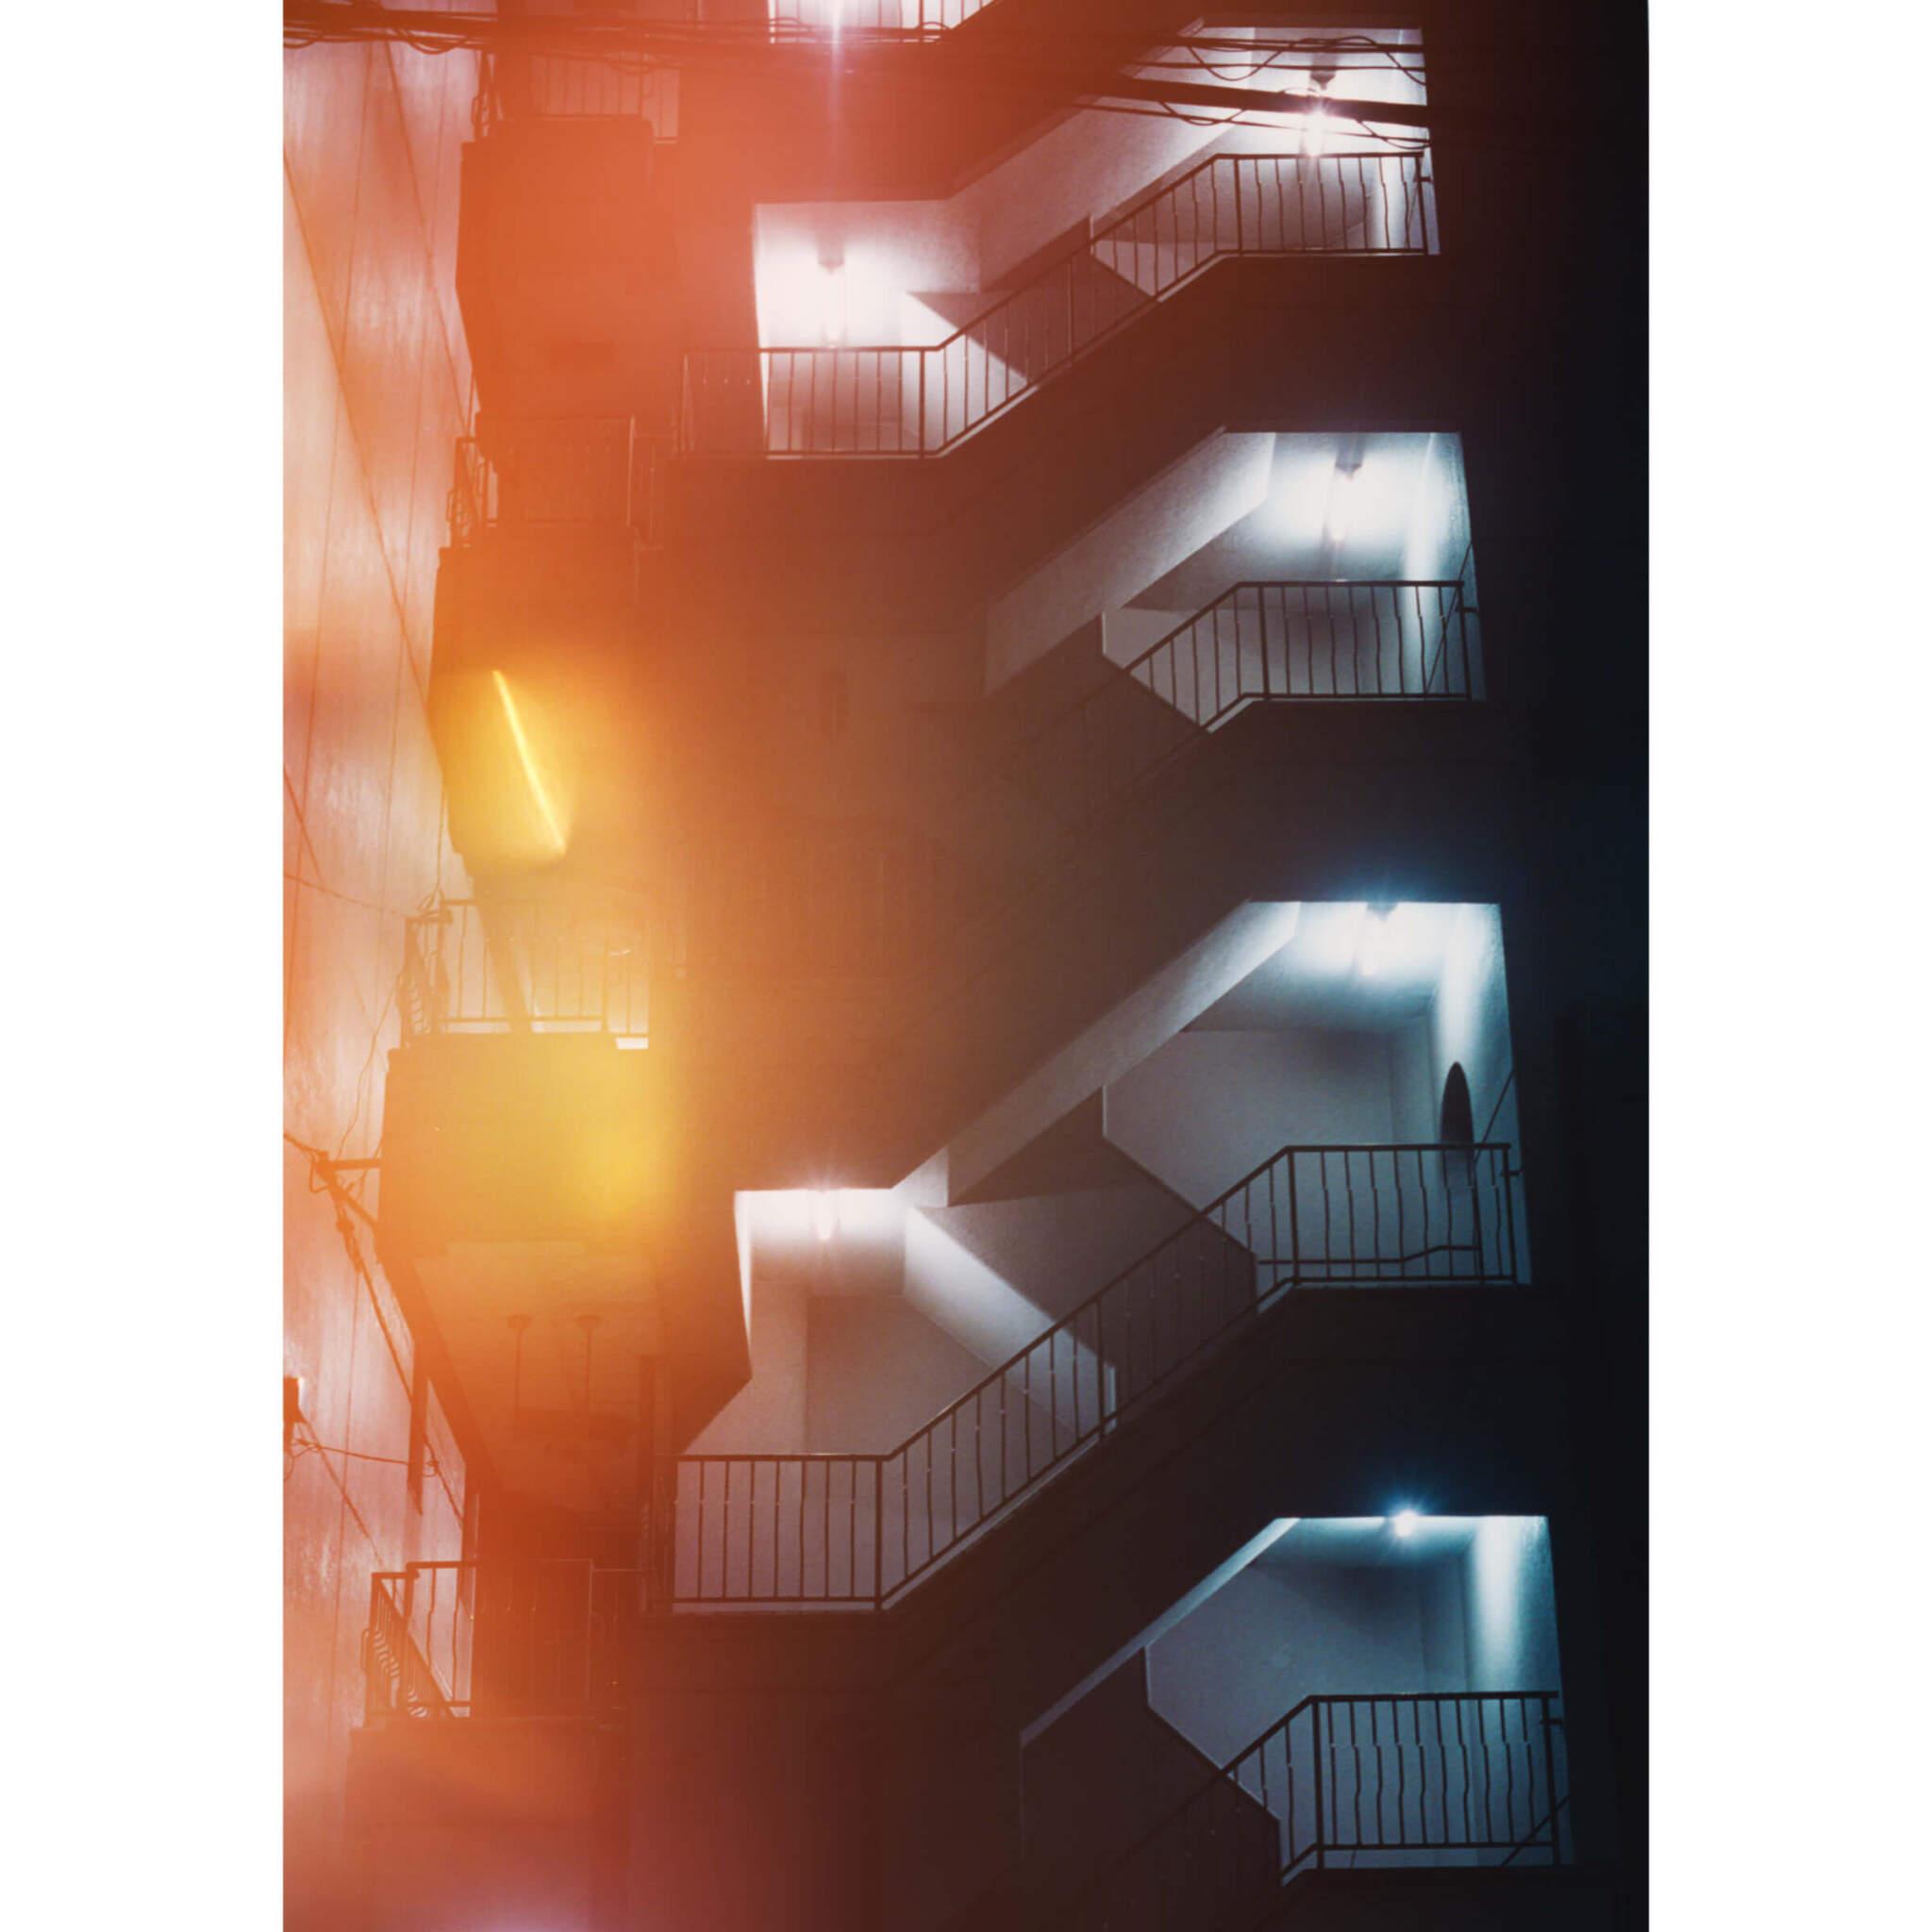 78030226 8FCB 4483 B600 EC5F8F161997 - Night Stairs by Ben Stockley